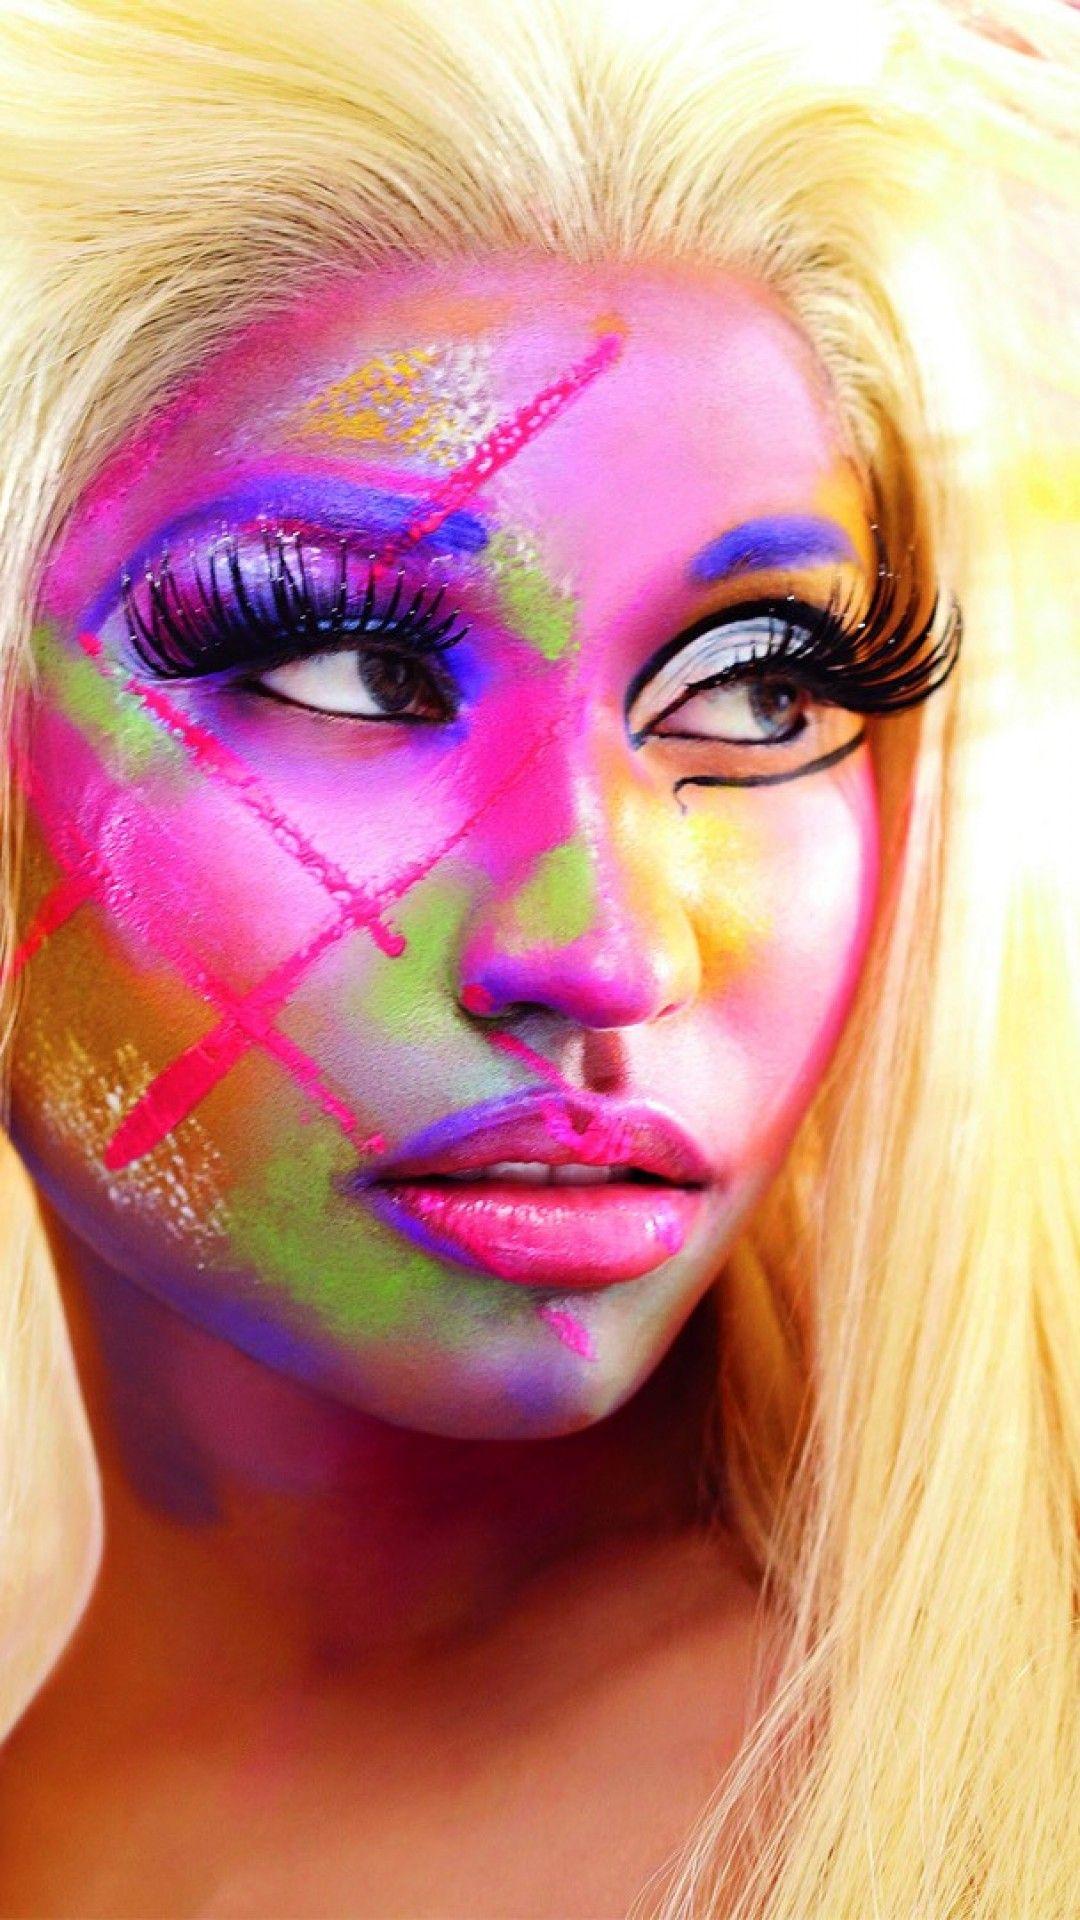 Nicki Minaj Iphone Background Nicki Minaj Iphone